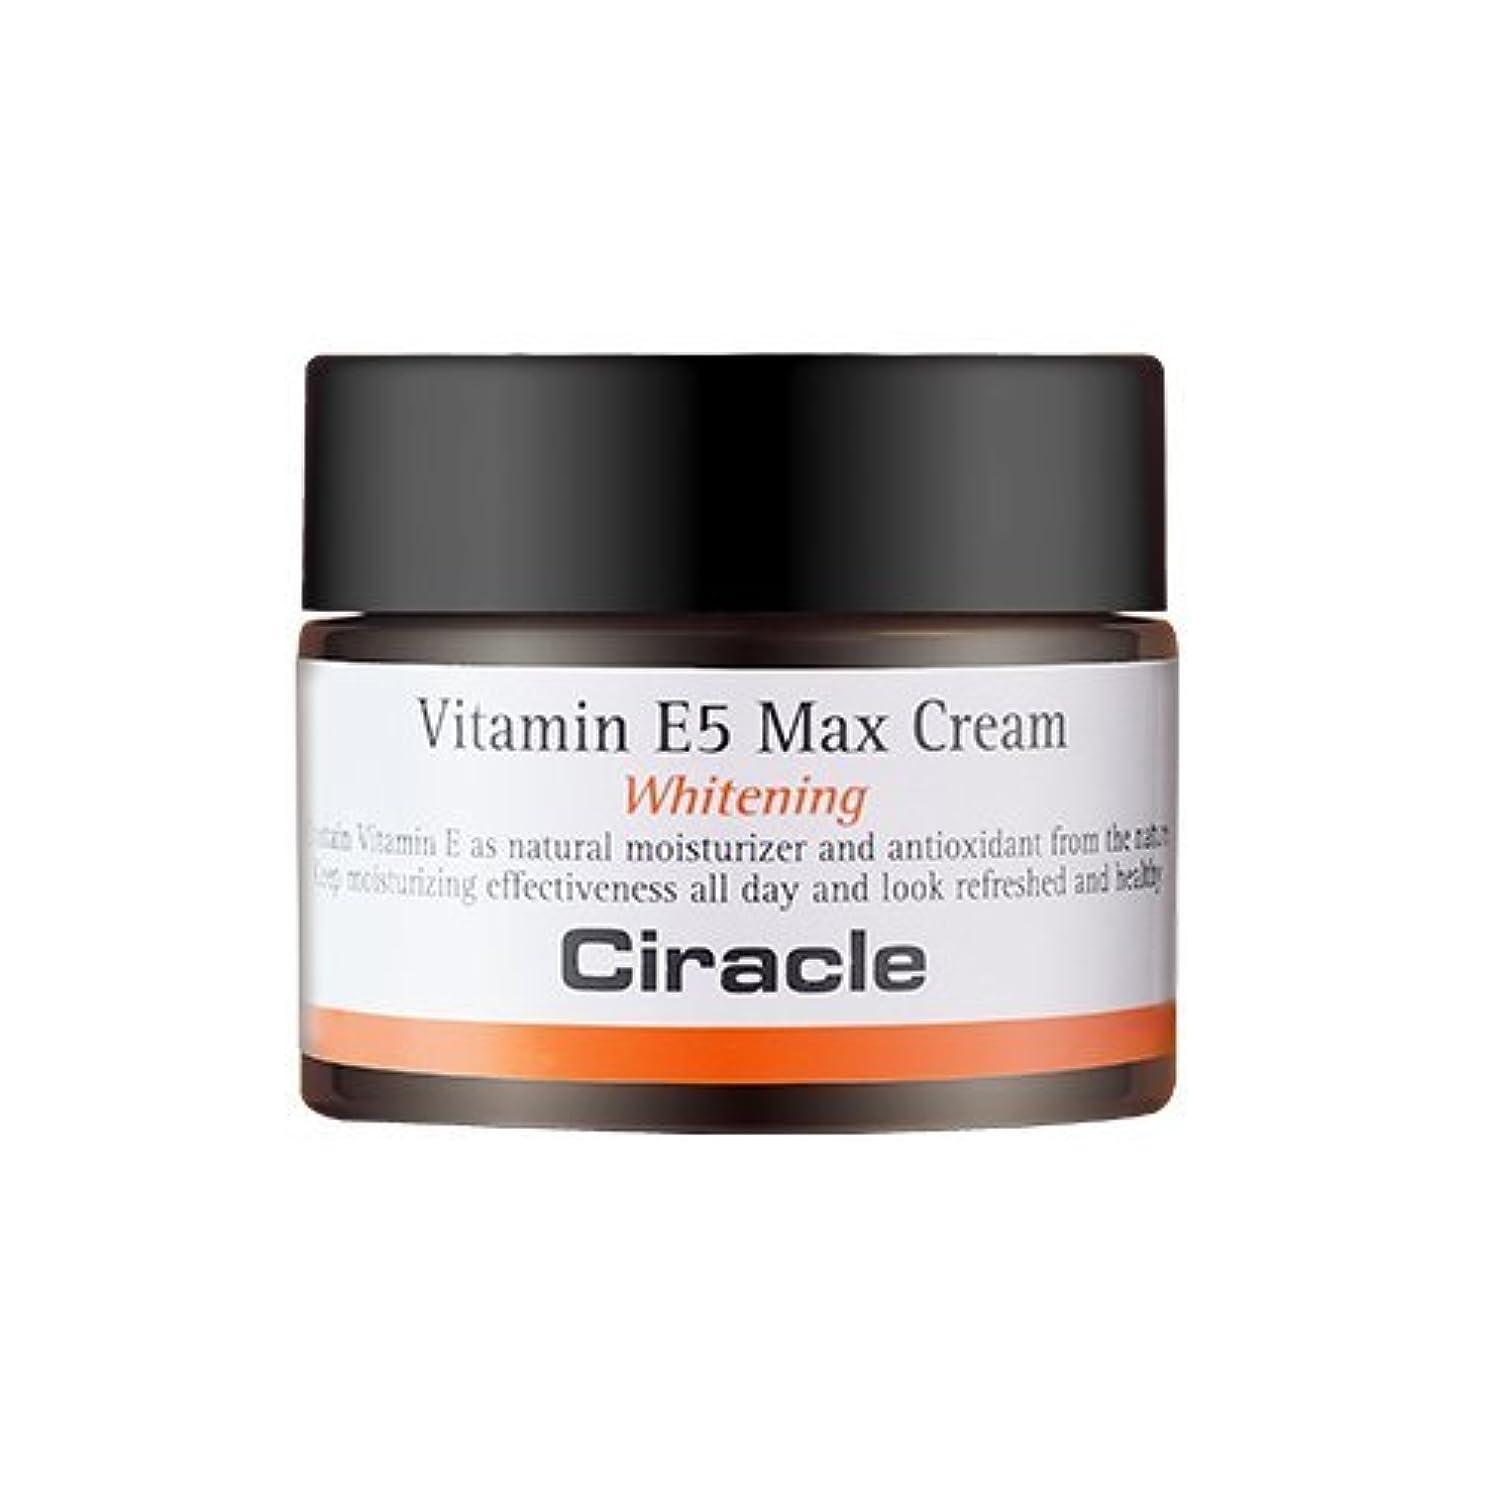 Ciracle Vitamin E5 Max Cream シラクル ビタミンE5 マックス クリーム 50ml [並行輸入品]